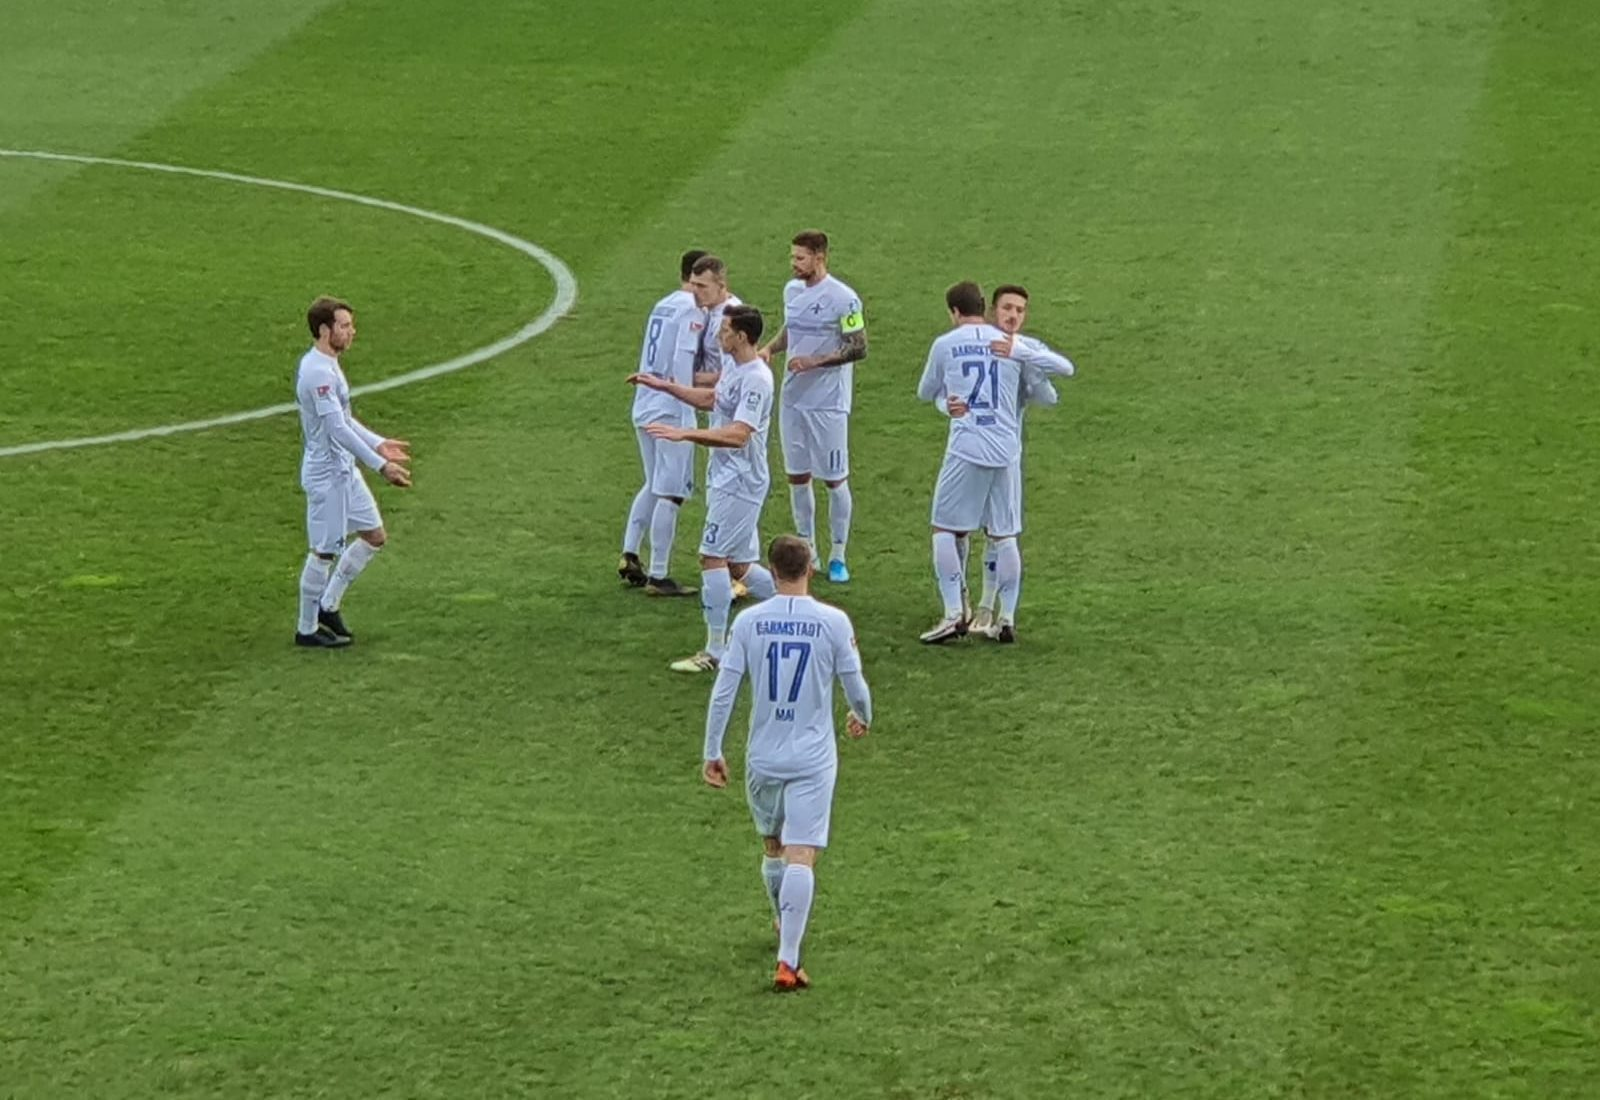 VfL Bochum – SV Darmstadt 98 2:1 (0:0)